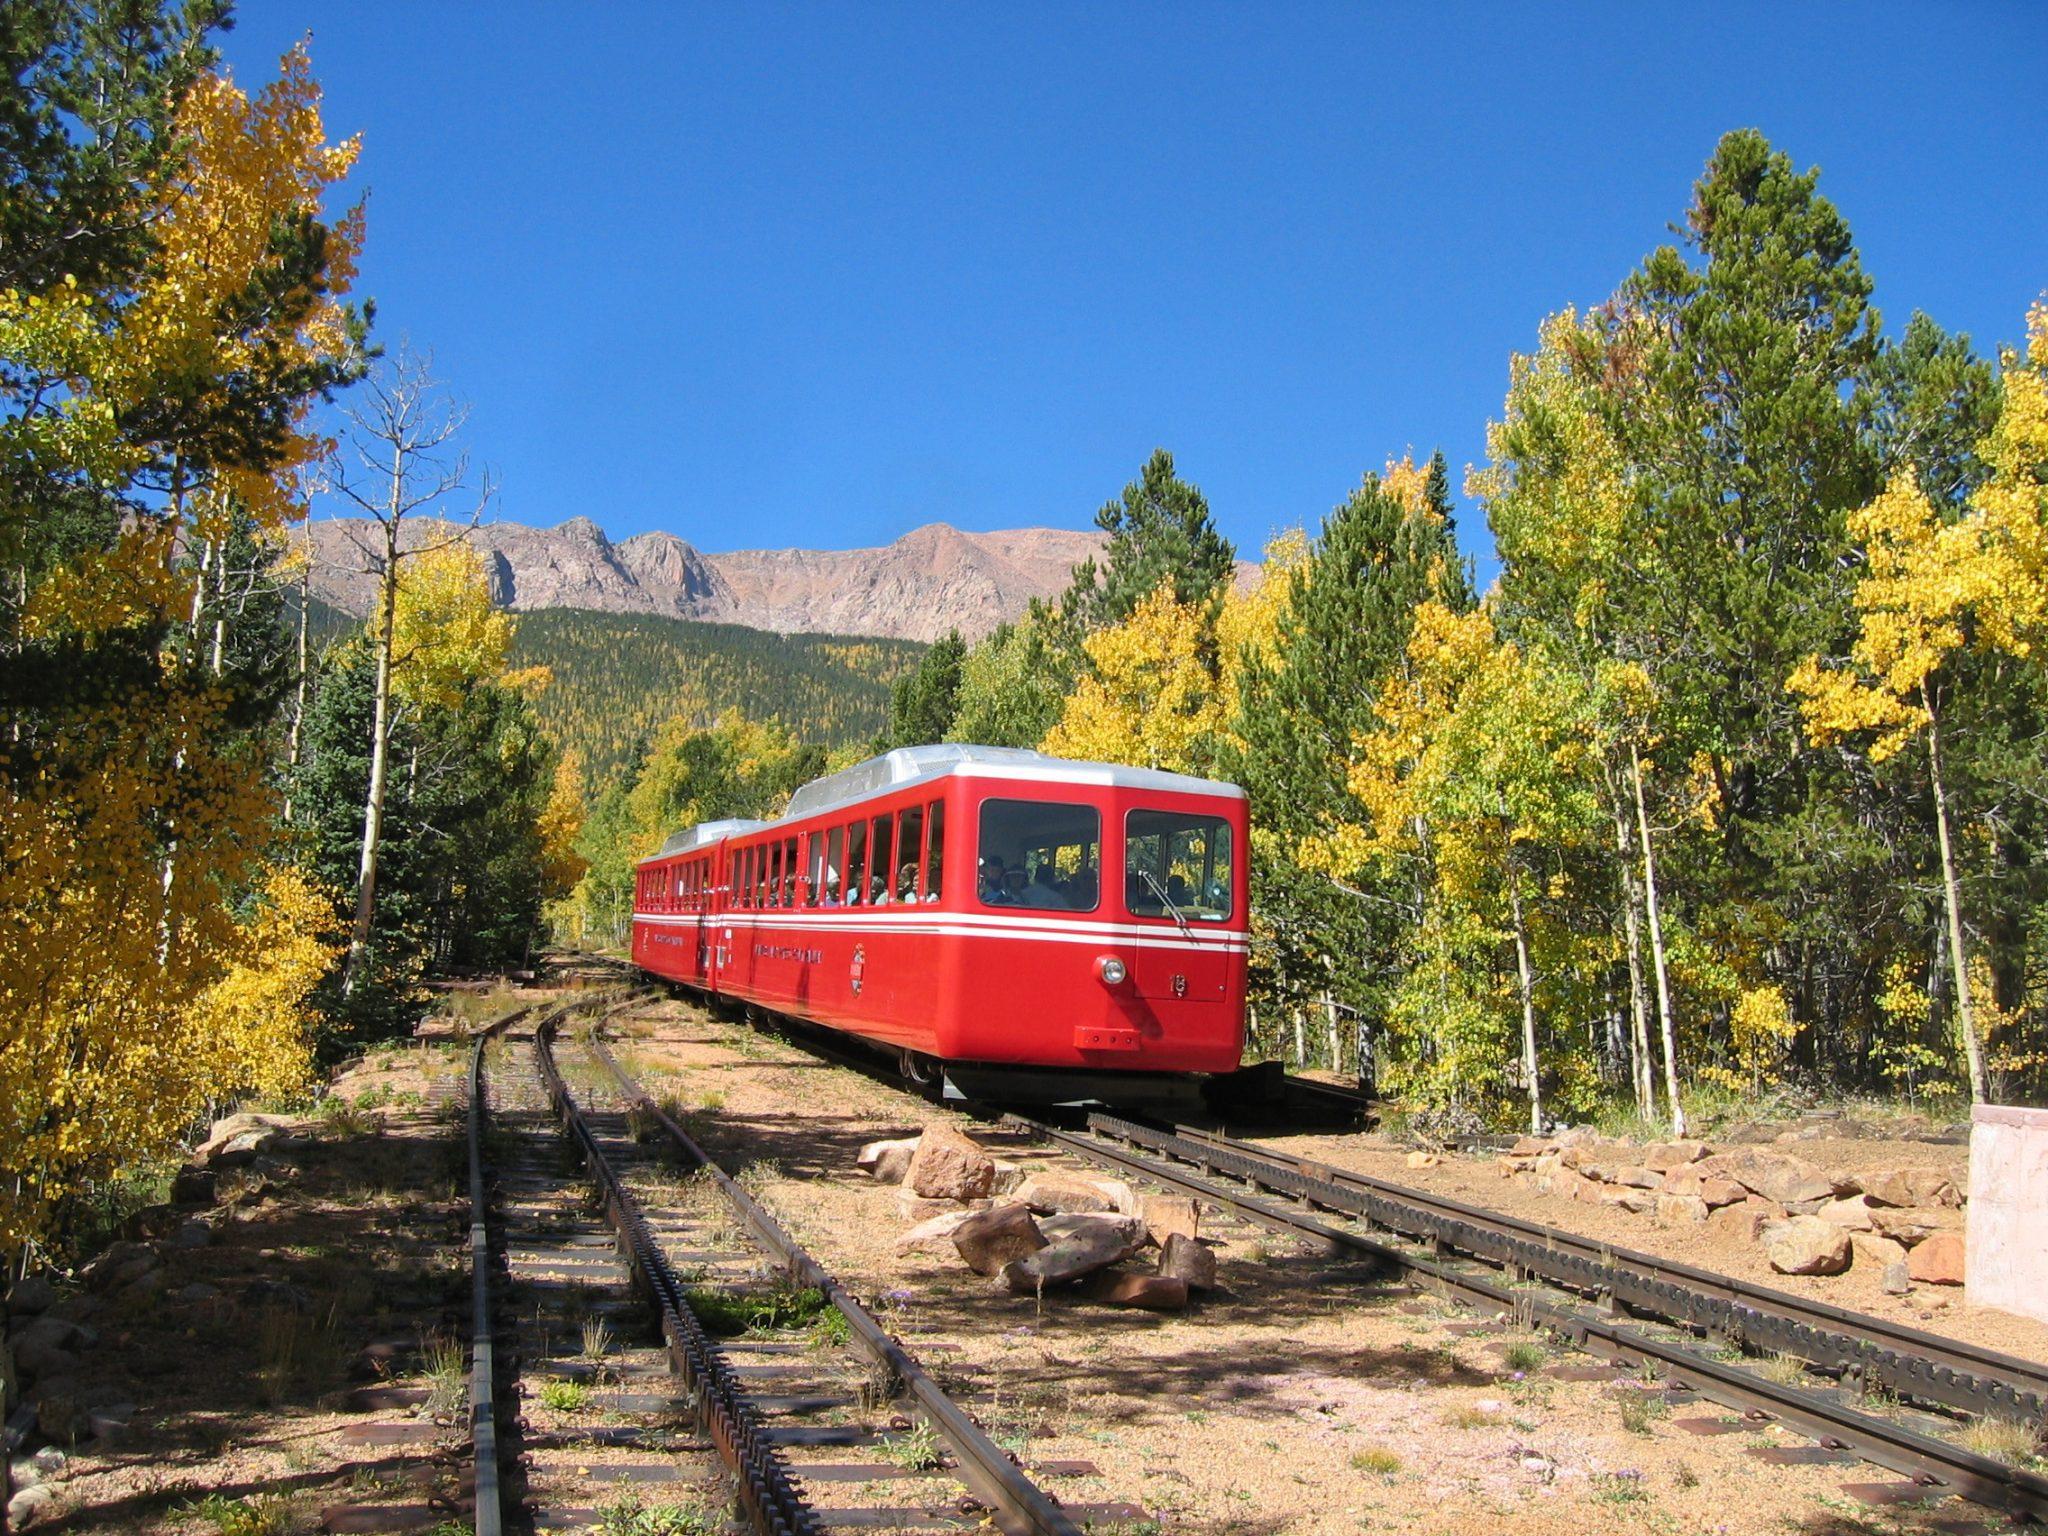 The Pikes Peak Cog Railway takes you to the 14,115′ summit of Pikes Peak